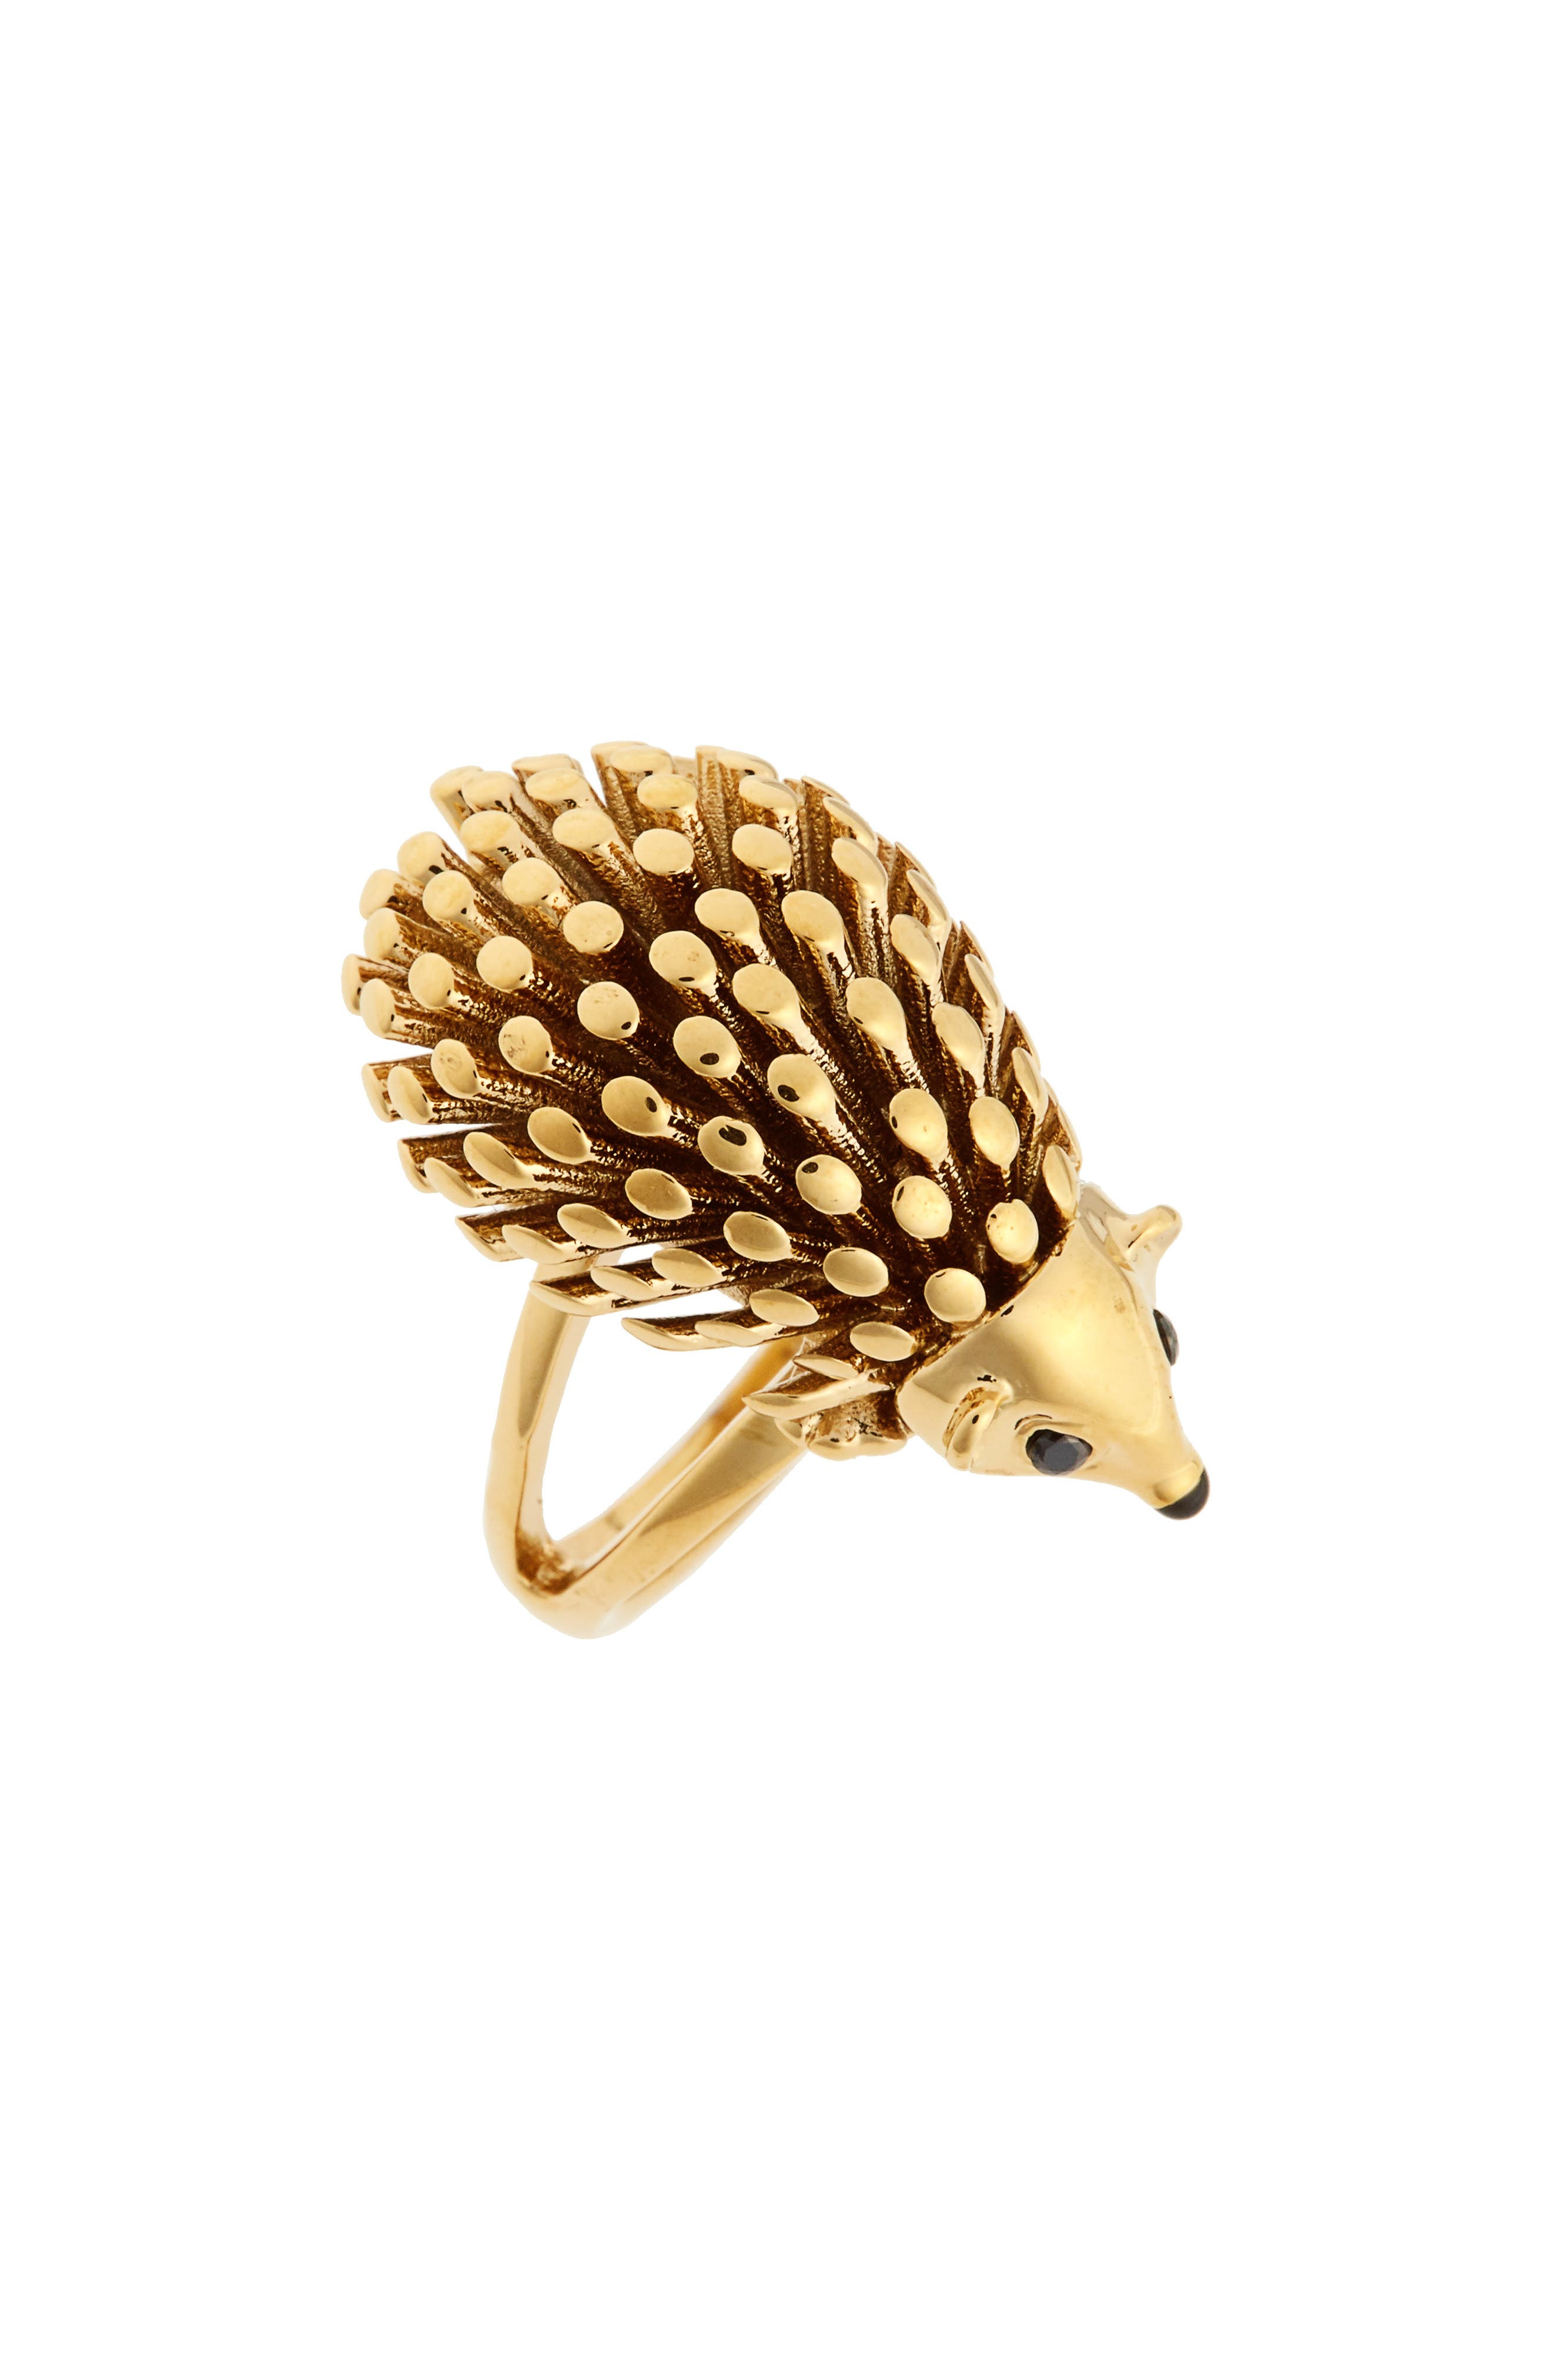 KATE SPADE NEW YORK kate spade baja bound porcupine ring